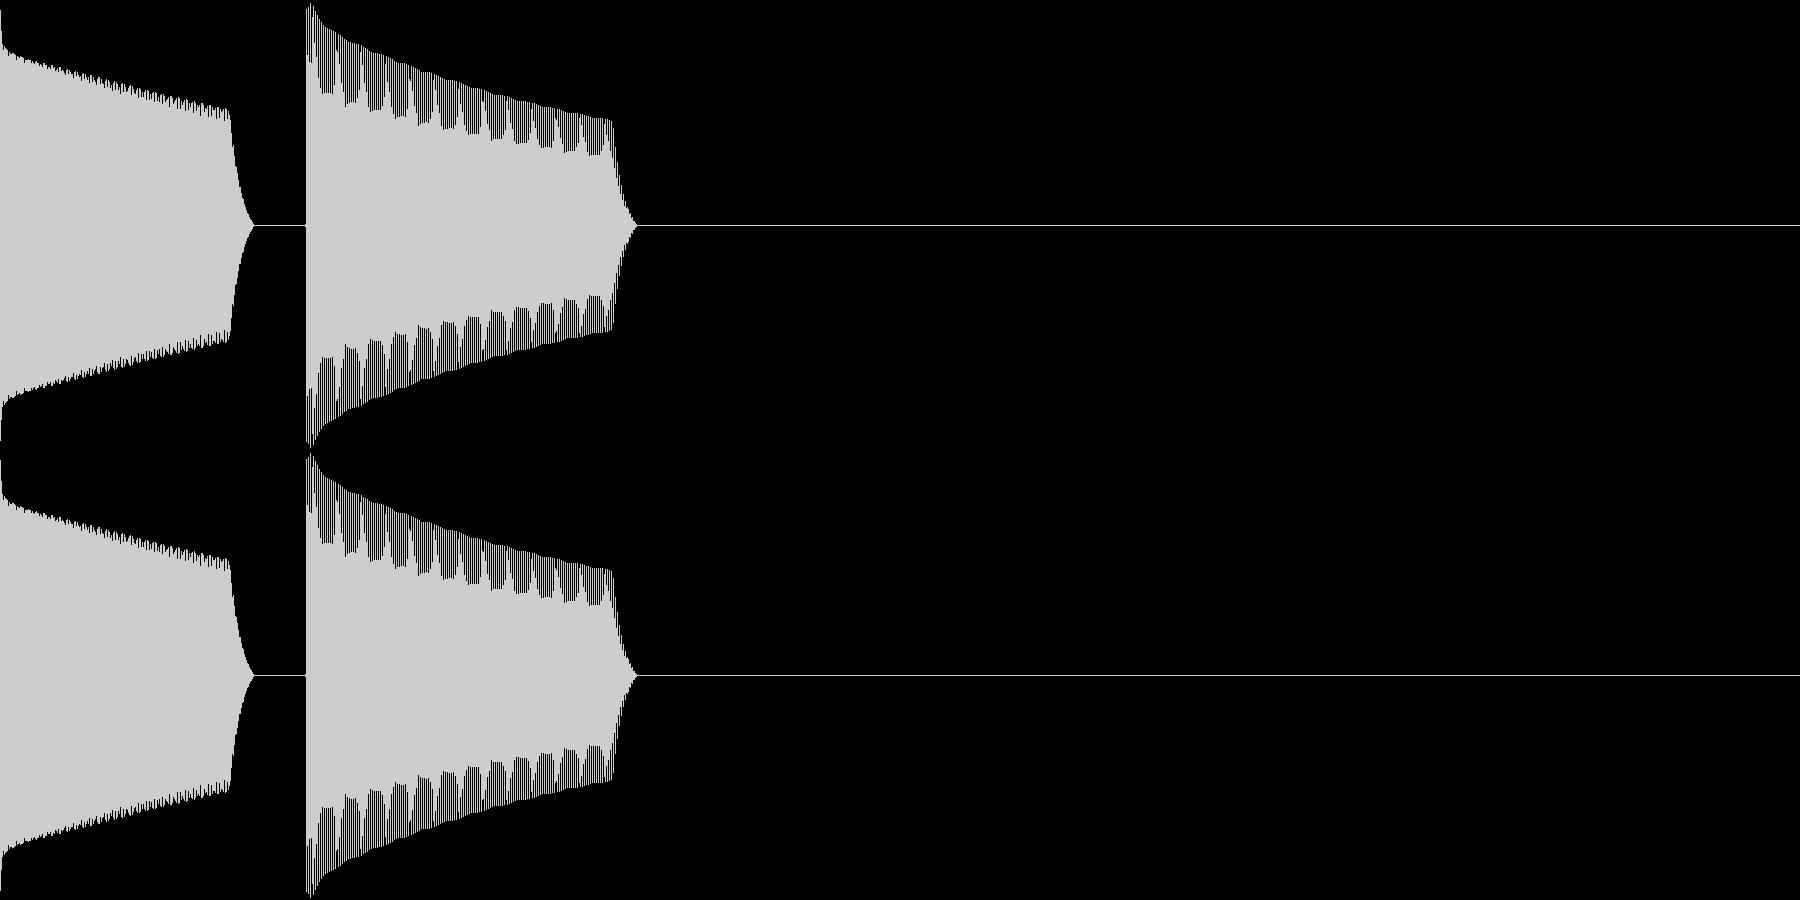 ATM 操作音 3の未再生の波形